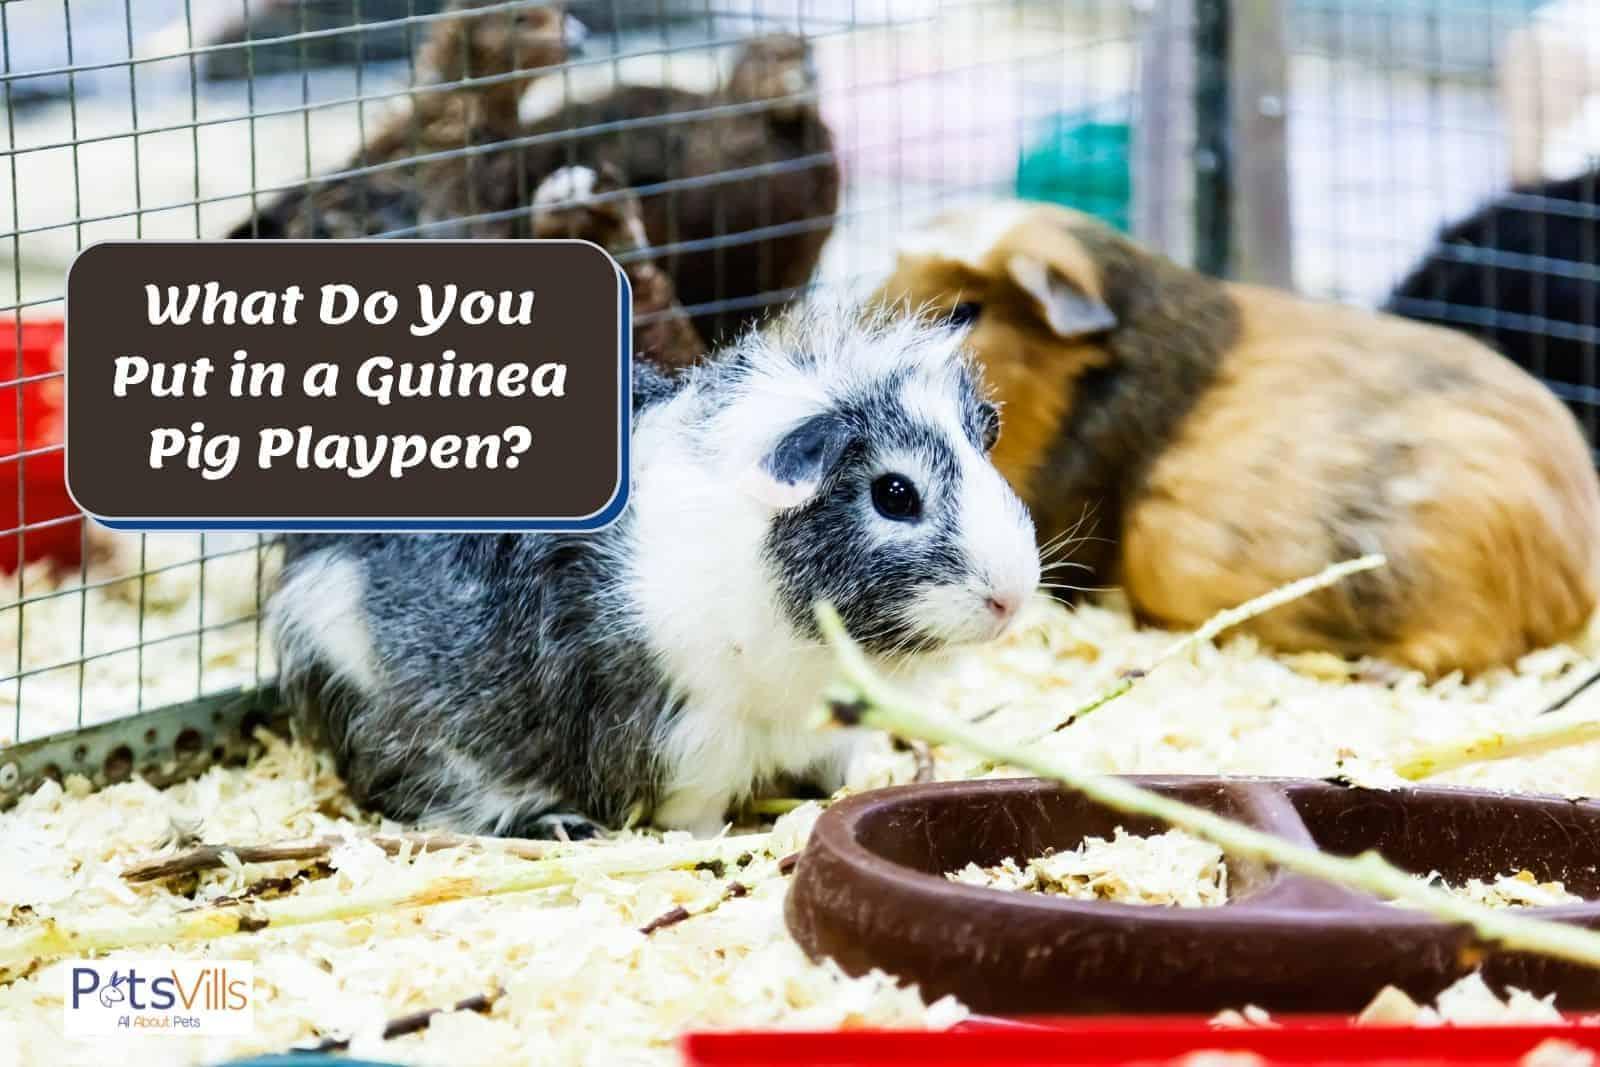 guinea pigs in a playpen